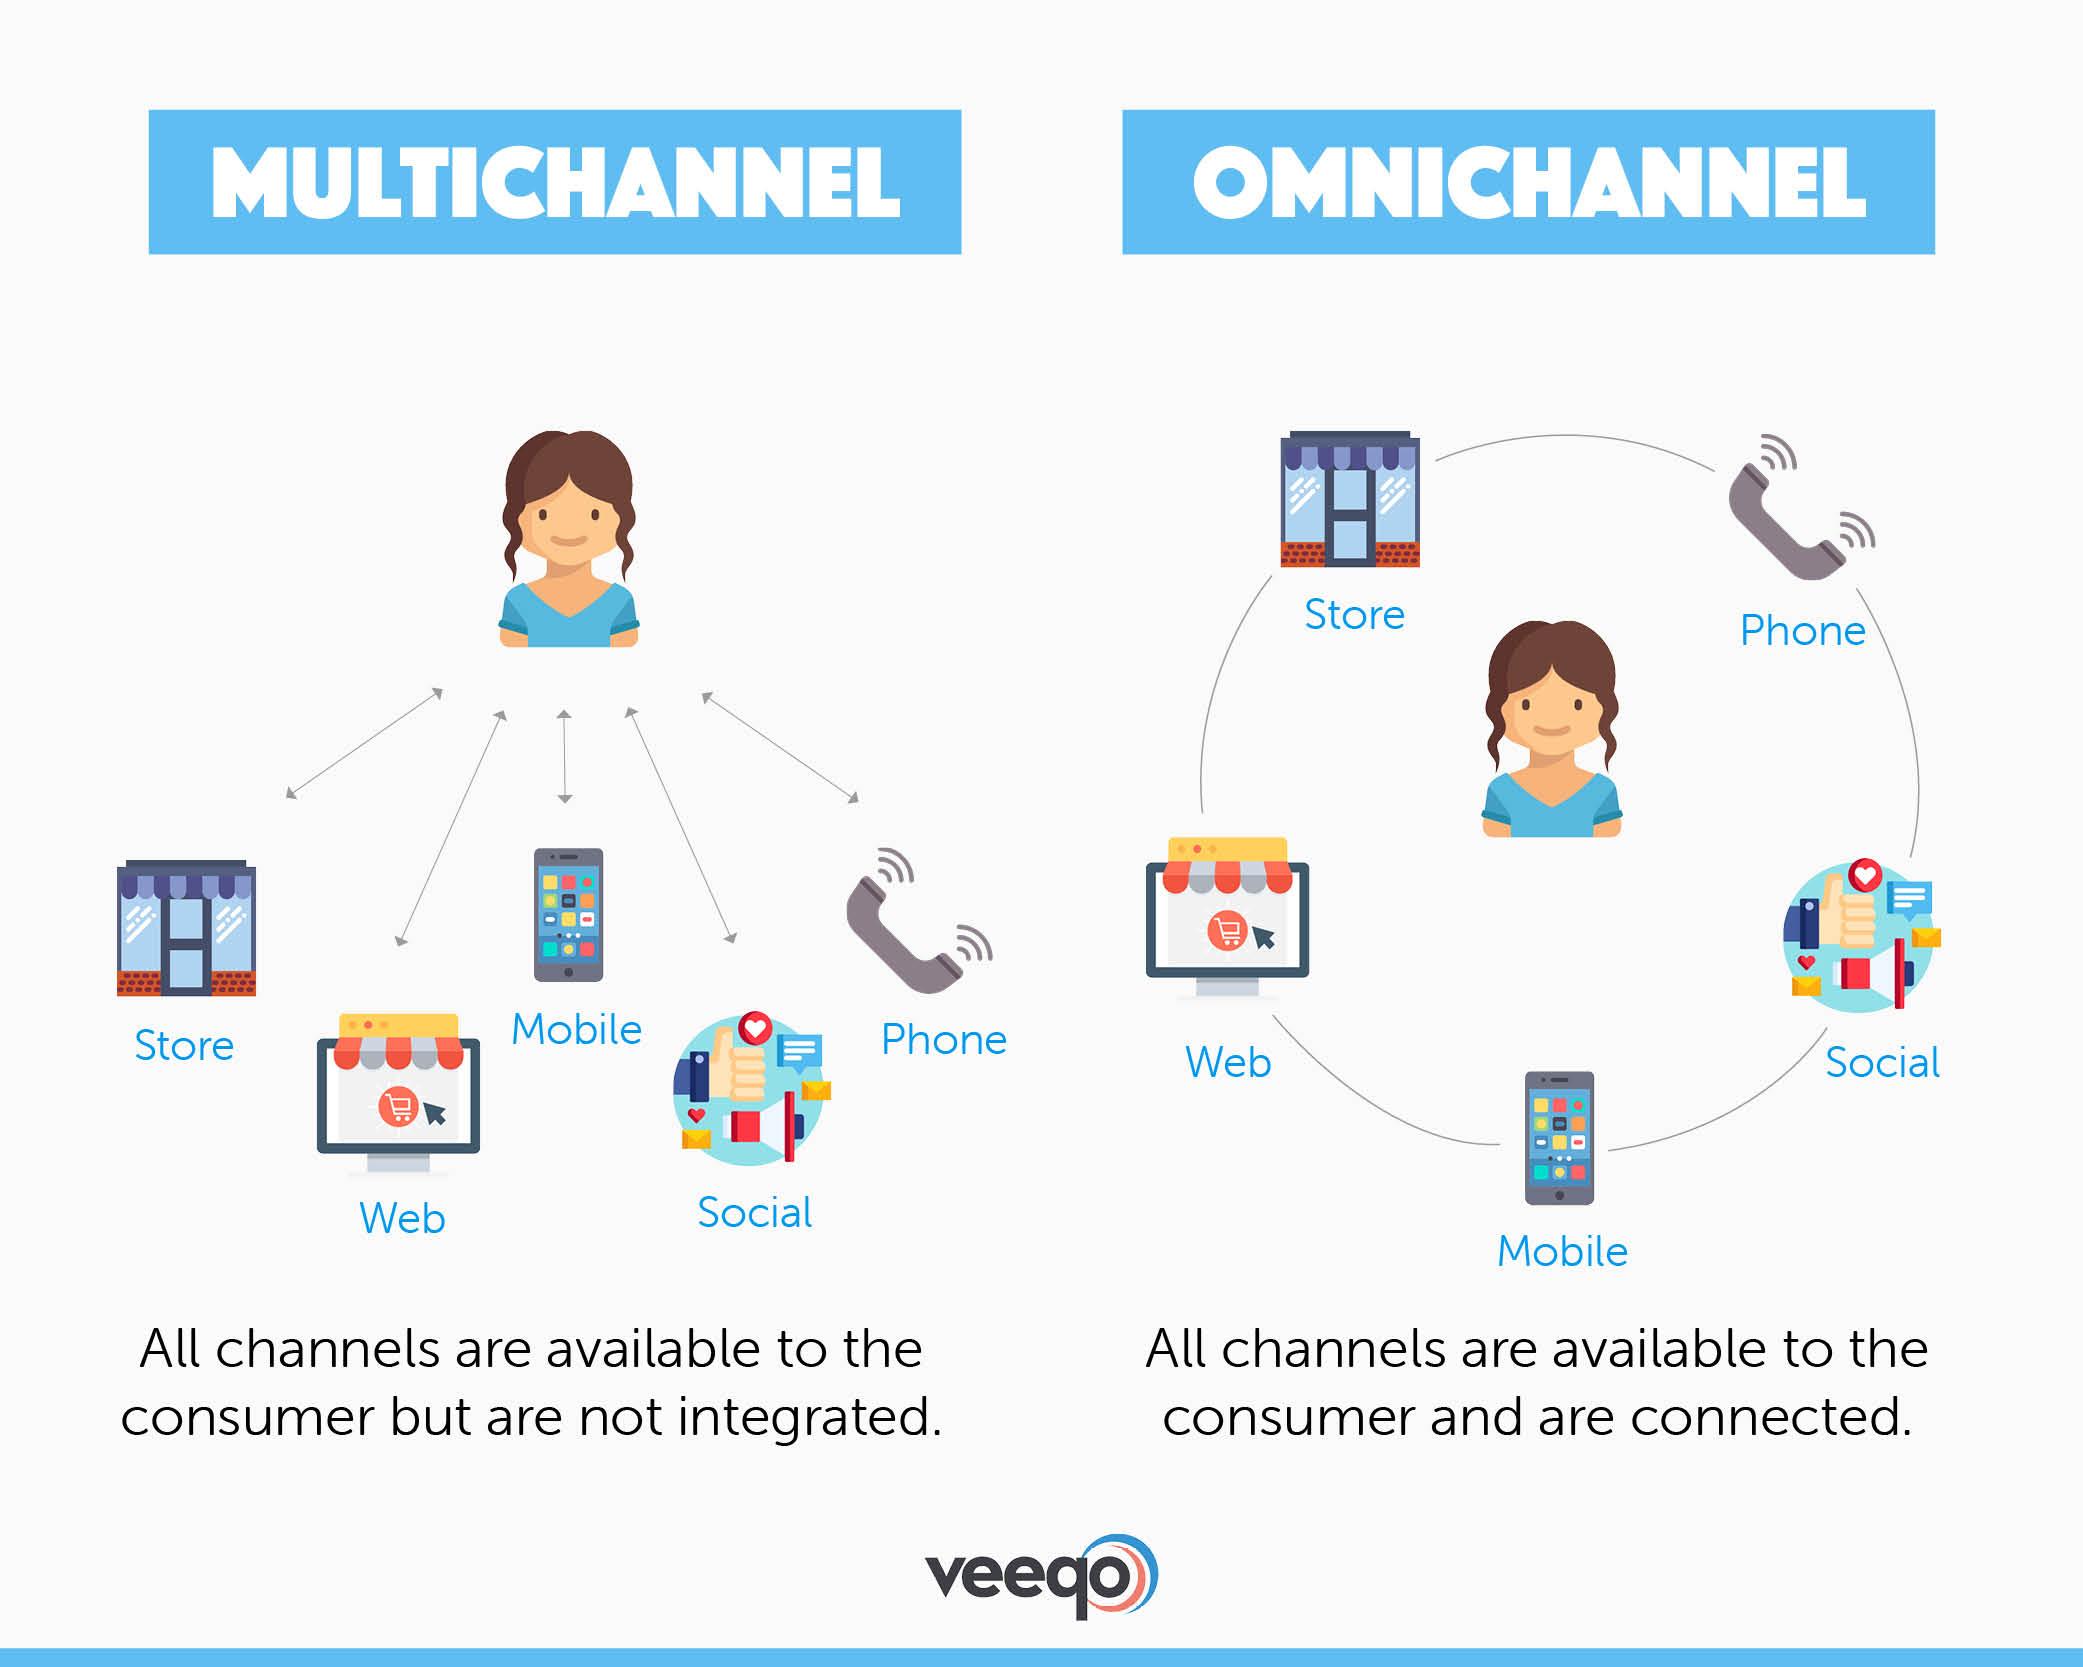 A visual representation of multichannel versus omnichannel customer service courtesy of Veeqo.